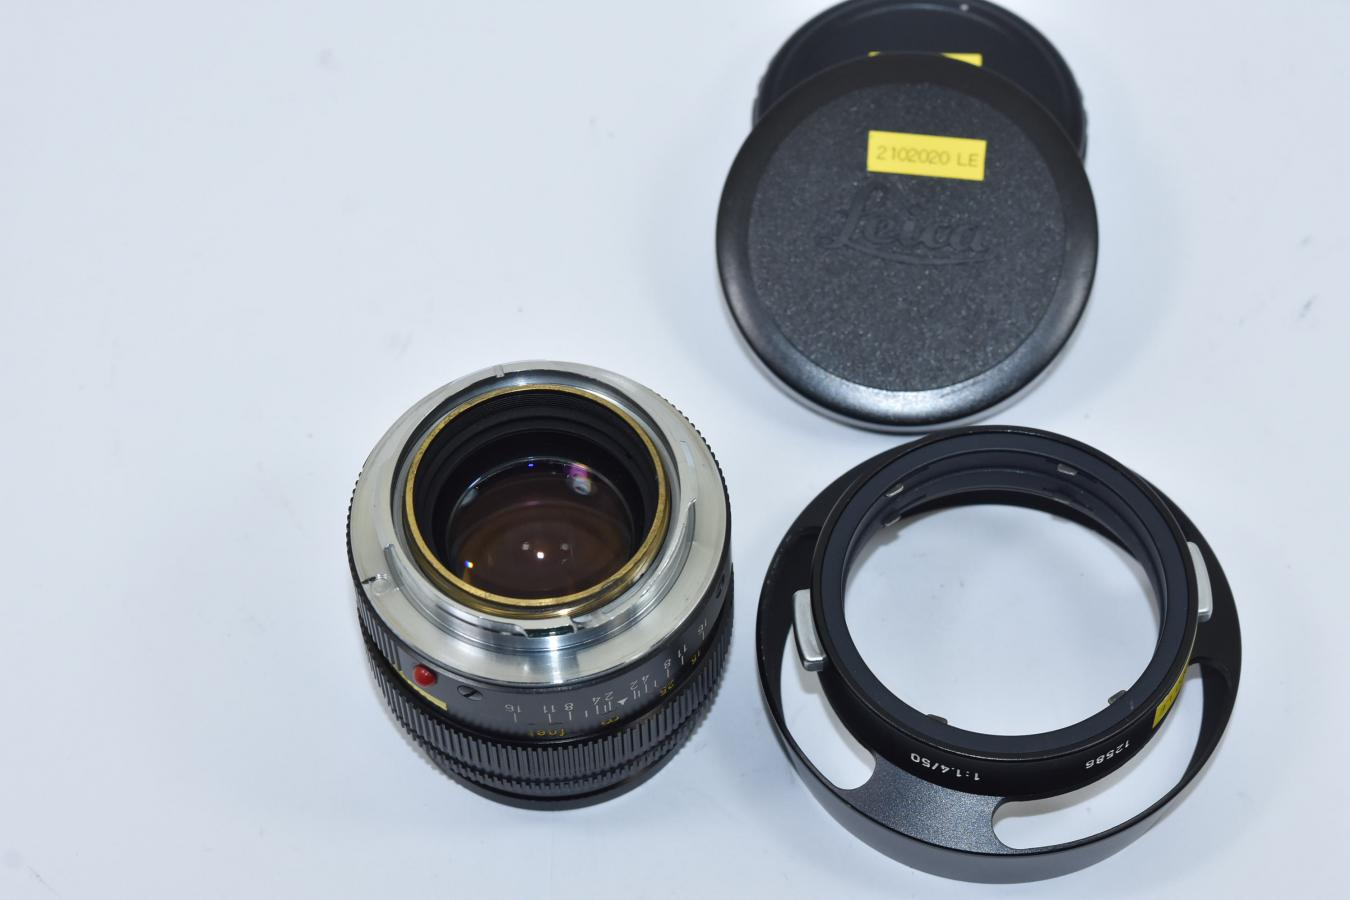 LEICA SUMMILUX-M 50mm F1.4 ブラック 純正フード12586付 【256万台 1973年製】